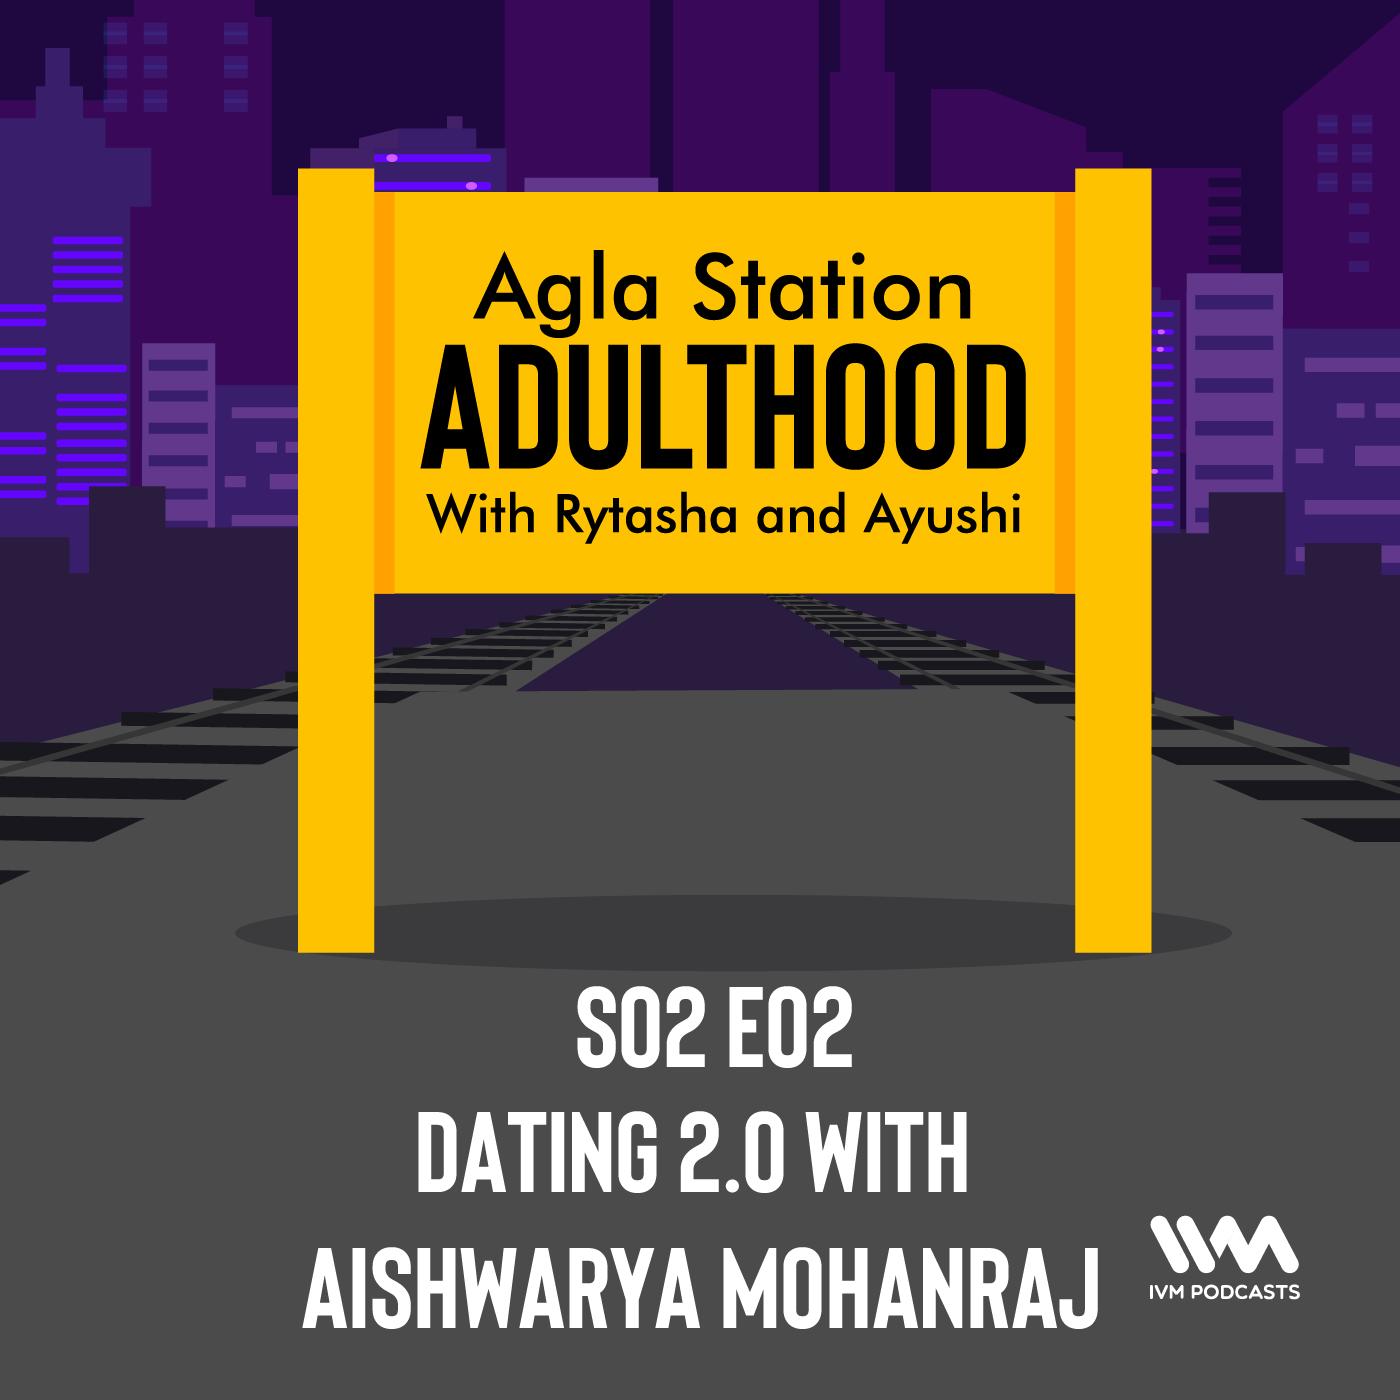 S02 E02: Dating 2.0 w/ Aishwarya Mohanraj